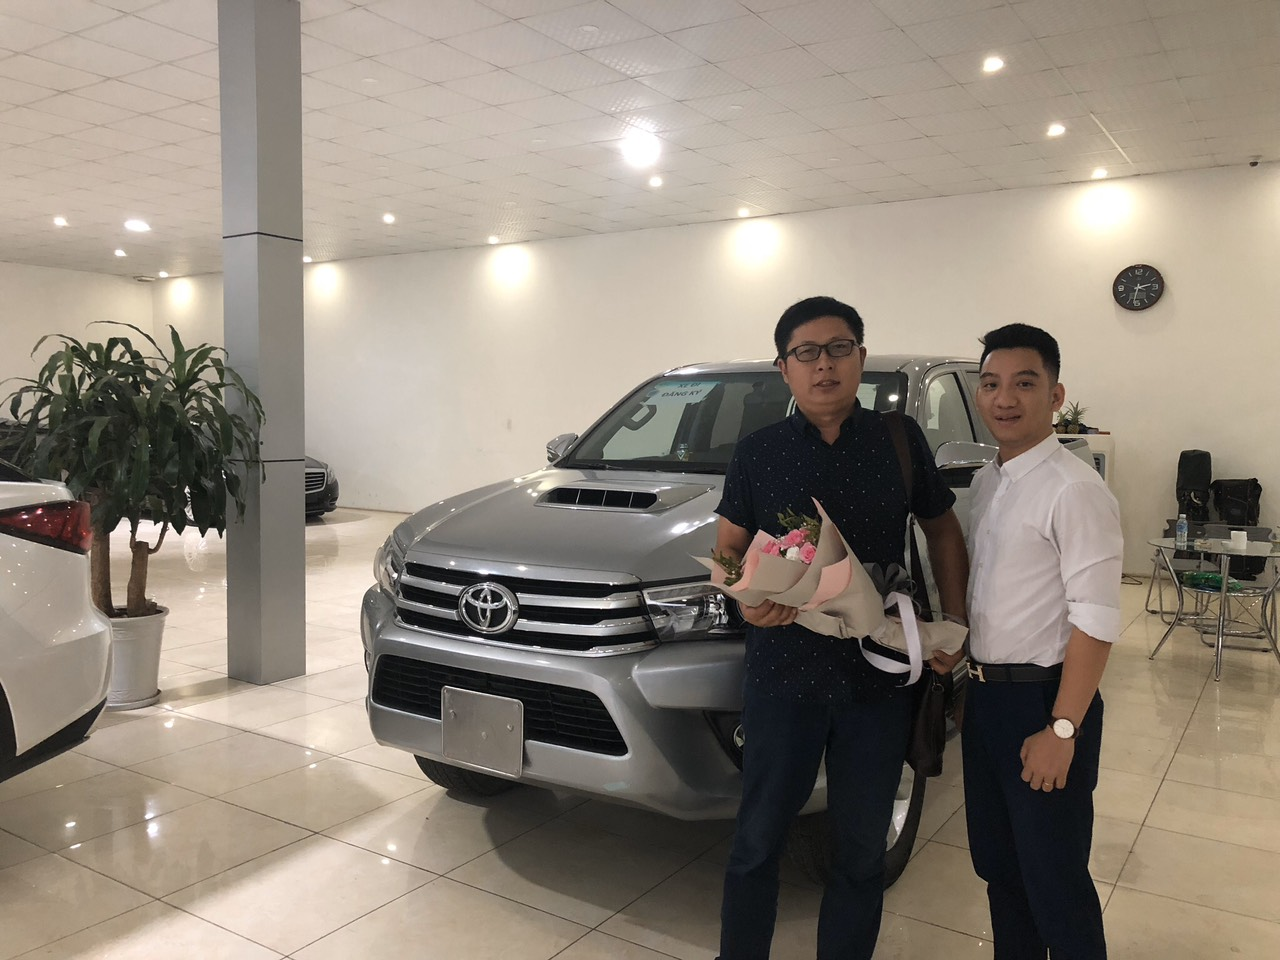 Toyota Hilux Q 2016 29LD-145-xx